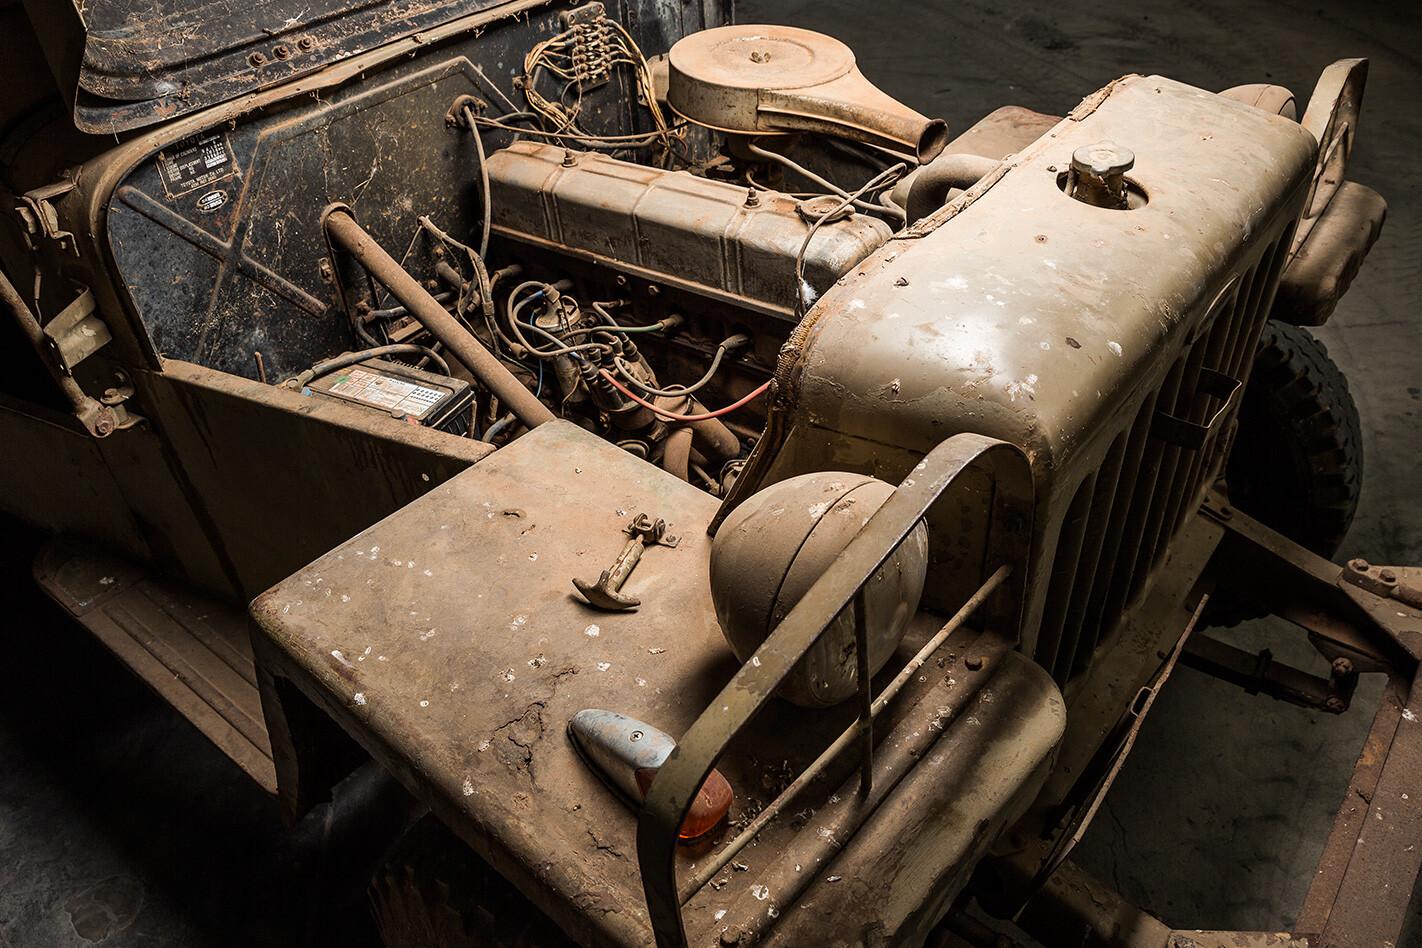 Toyota BJ FJ Land Cruiser evolution engine